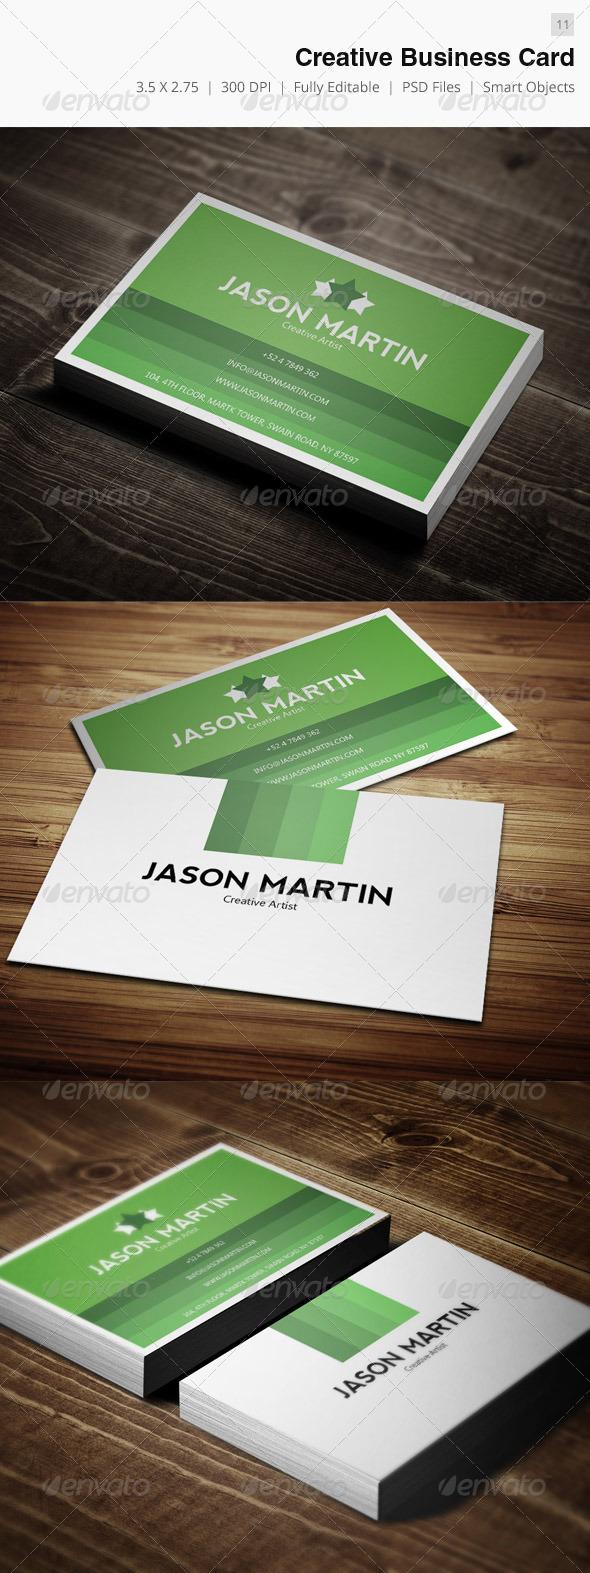 GraphicRiver Creative Business Card 11 3500908